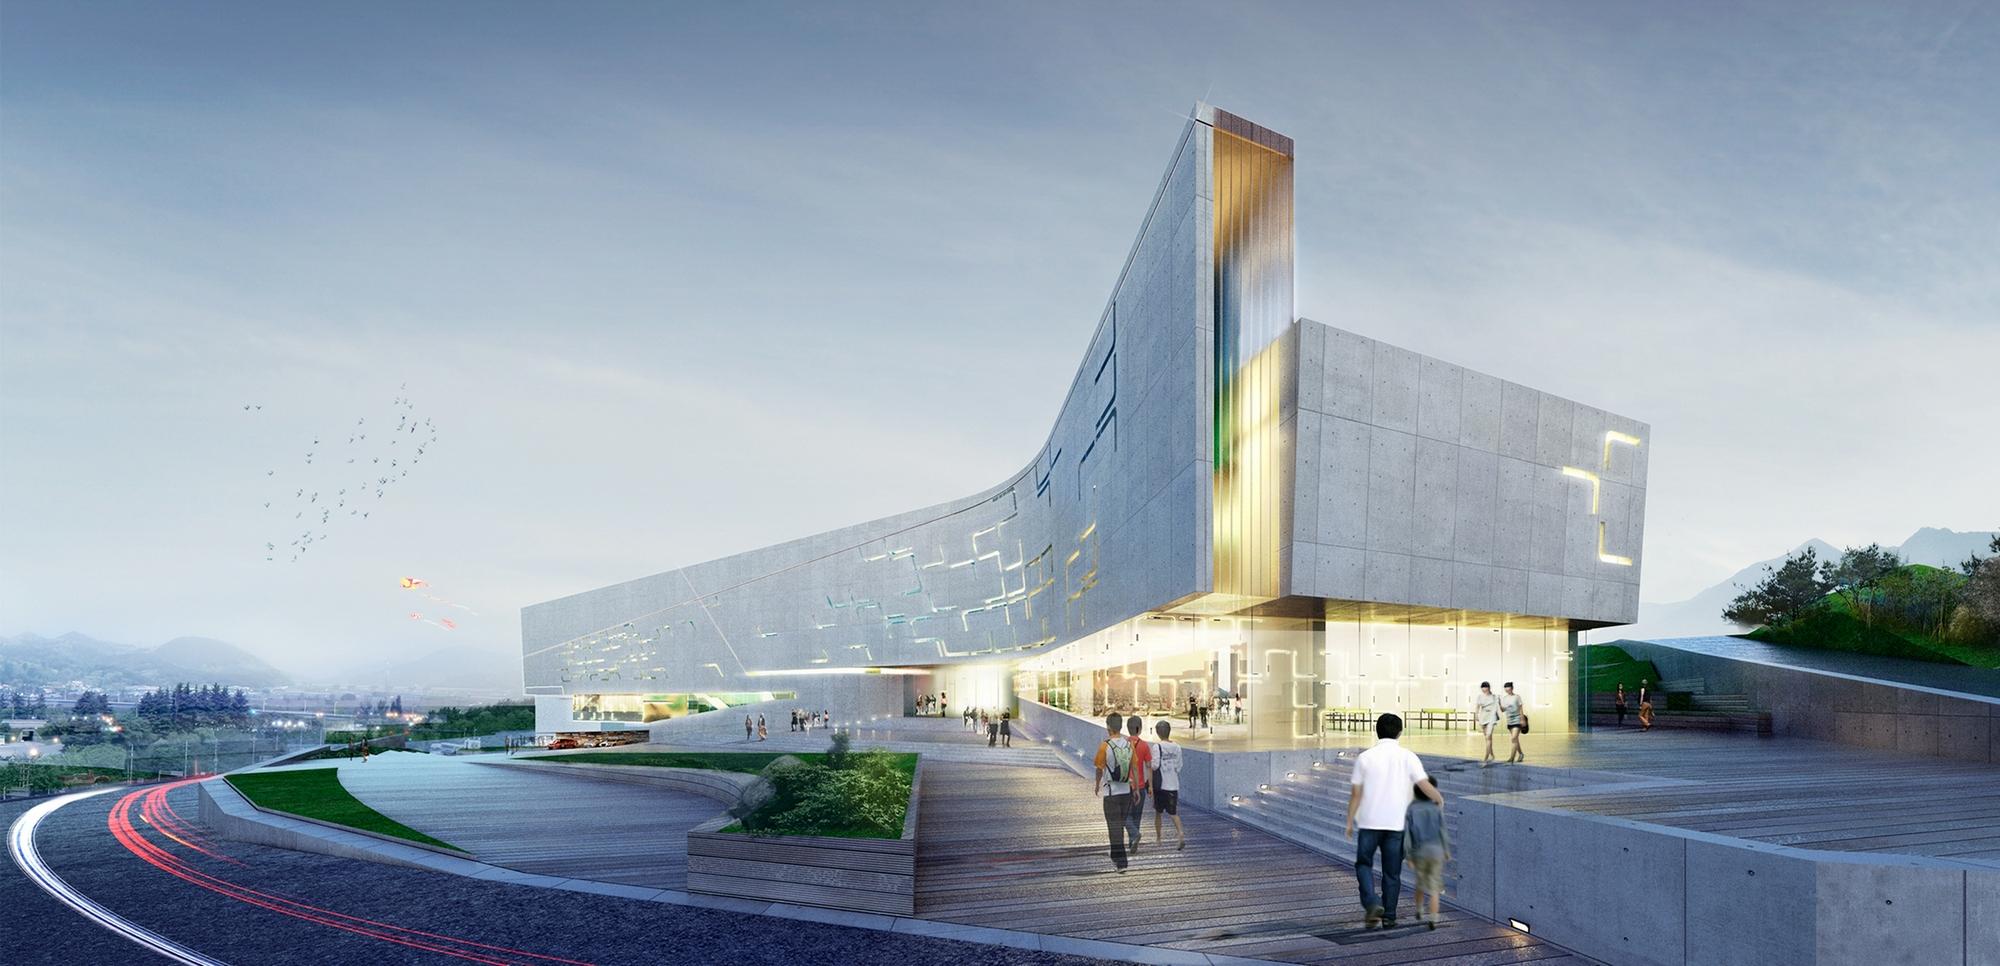 Sports Complex Project For The Daegu Gun Region Daegu City South Korea Architect Magazine